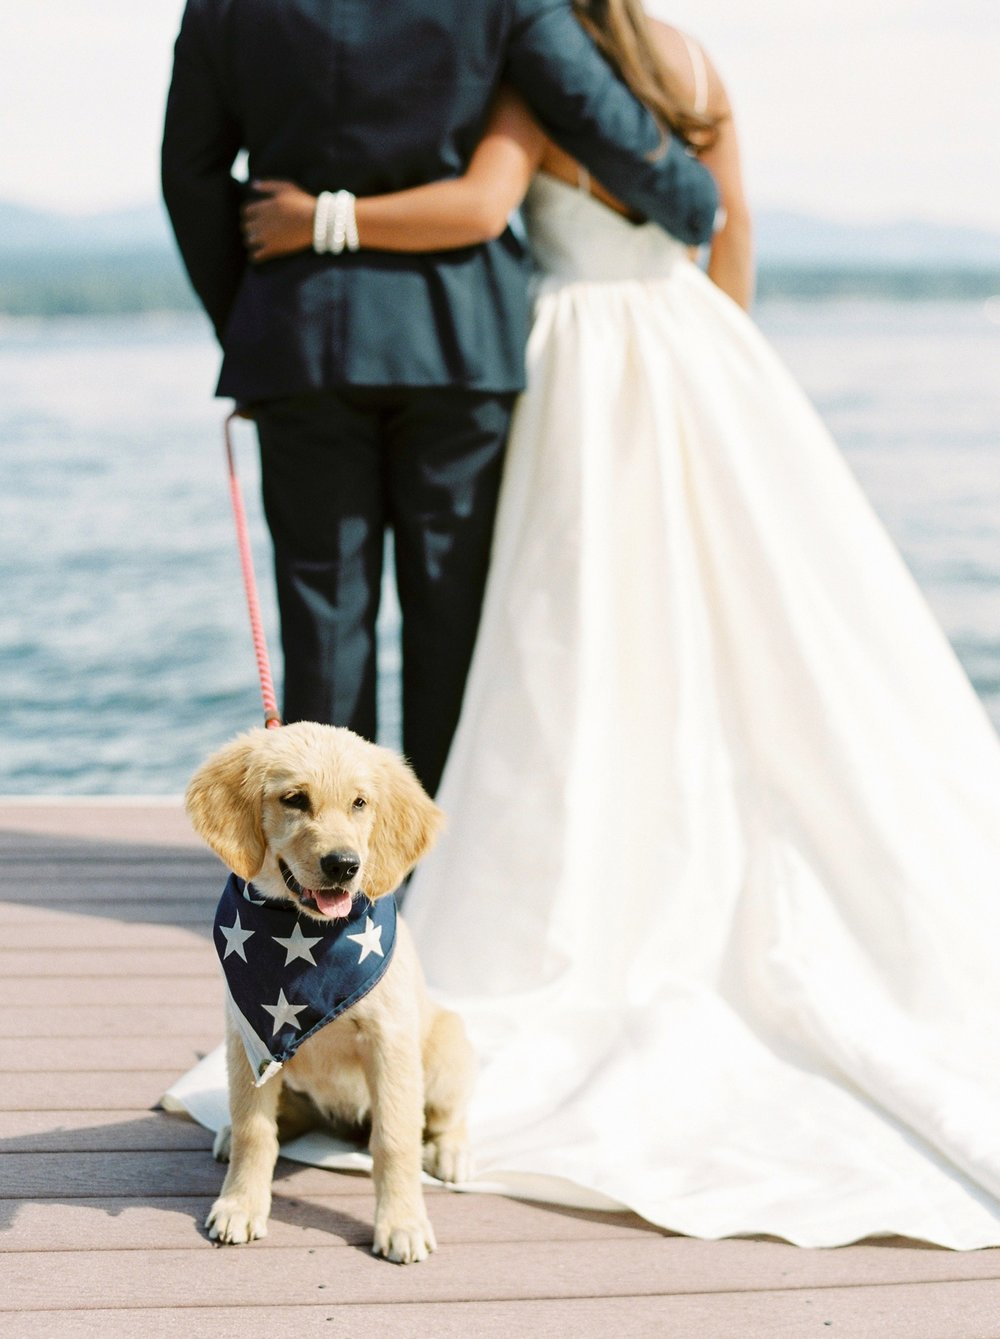 McCall Idaho Wedding Photographers | Justine Milton fine art film photography | Sun Valley photographer